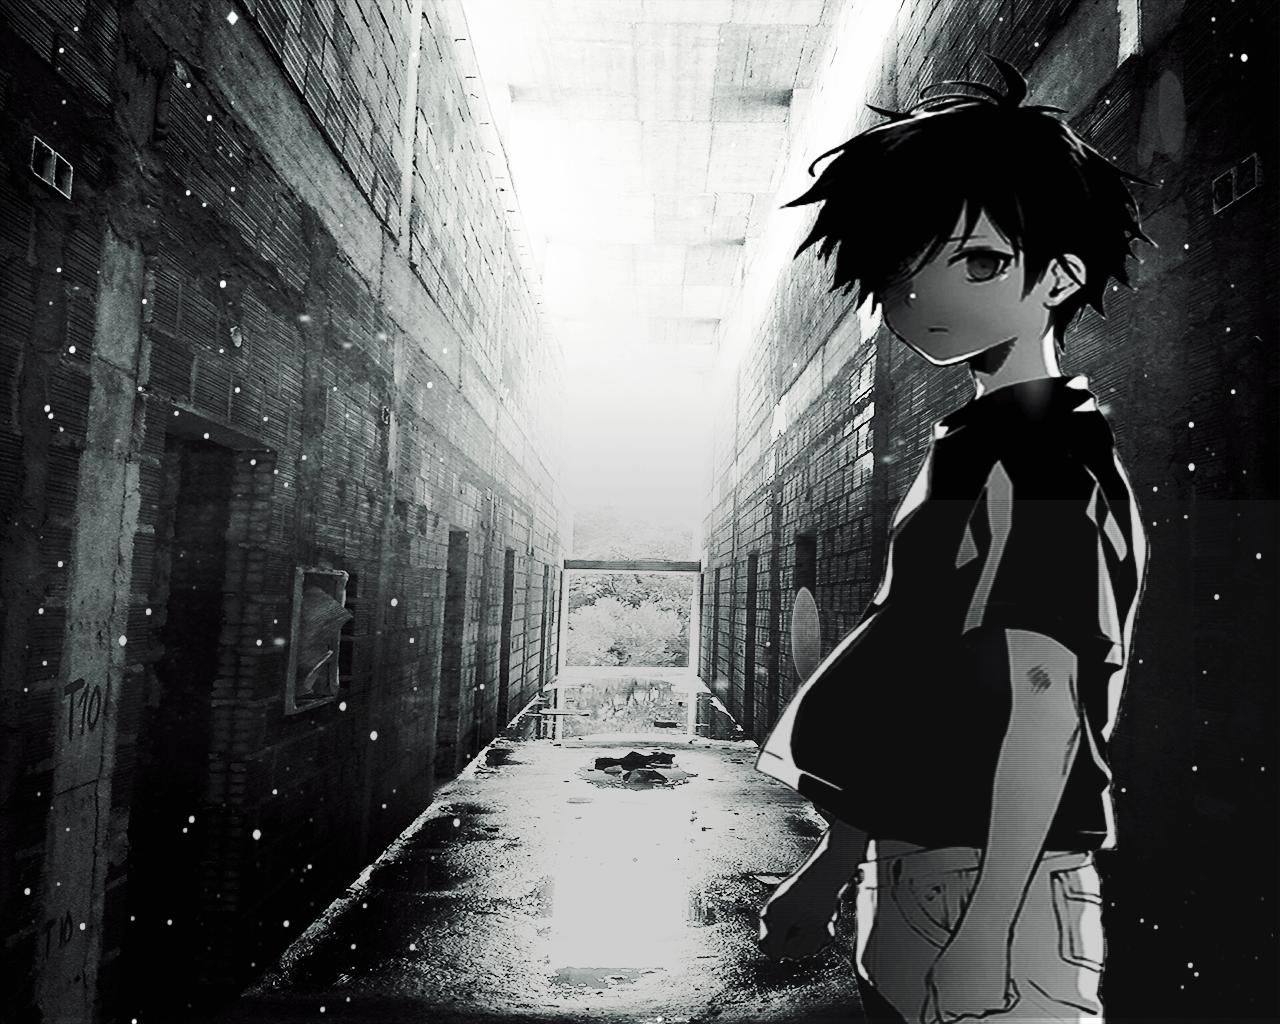 Free Download Back To 66 Sad Anime Boy Wallpapers Hd Monochrome 1029333 1280x1024 For Your Desktop Mobile Tablet Explore 55 Sad Anime Hd Wallpapers Sad Anime Hd Wallpapers Sad